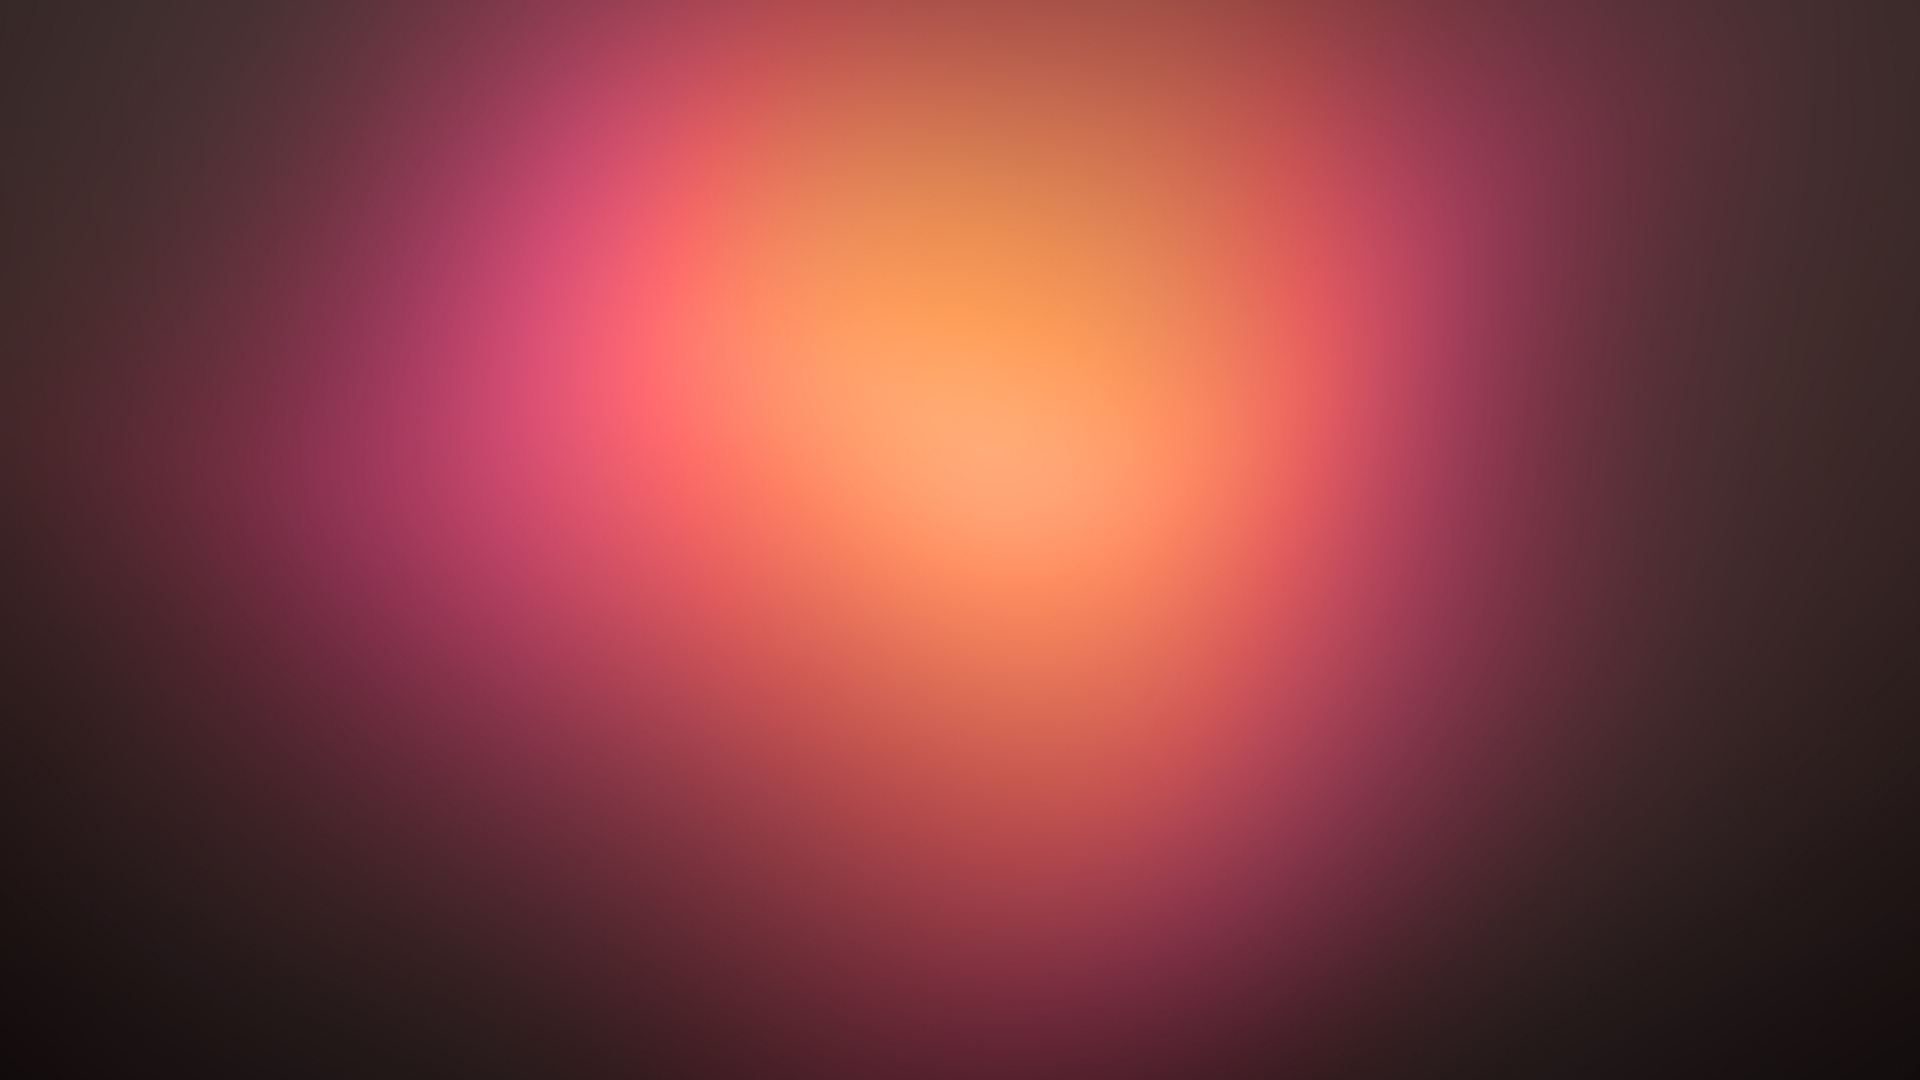 3d Motion Wallpaper For Mobile Blur Wallpapers Hd Download Free Pixelstalk Net